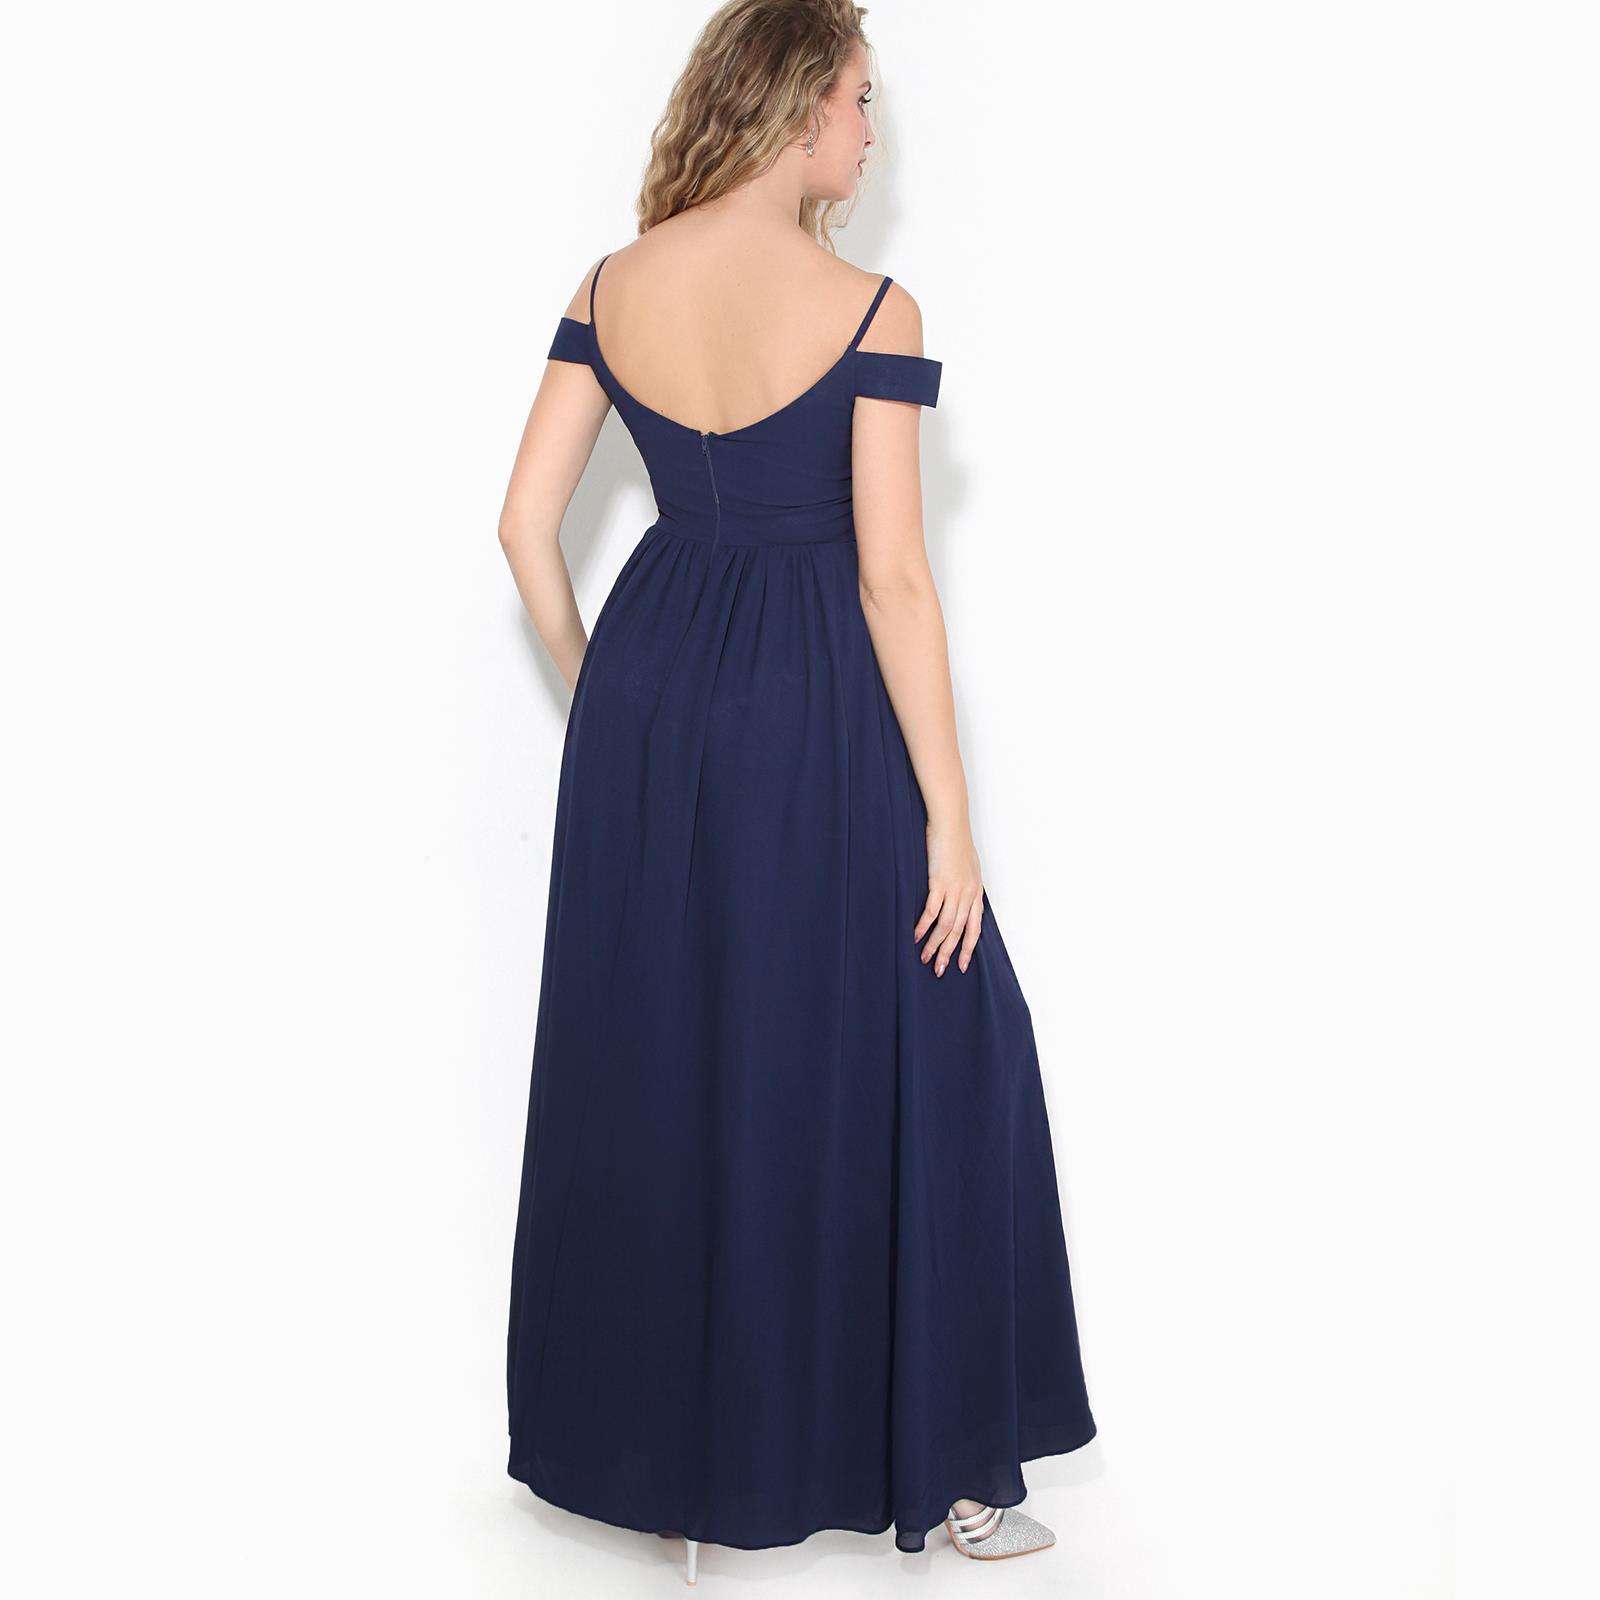 Womens-Ladies-Off-Shoulder-Formal-Maxi-Dress-Slit-Split-Long-Gown-Wedding-Party thumbnail 10